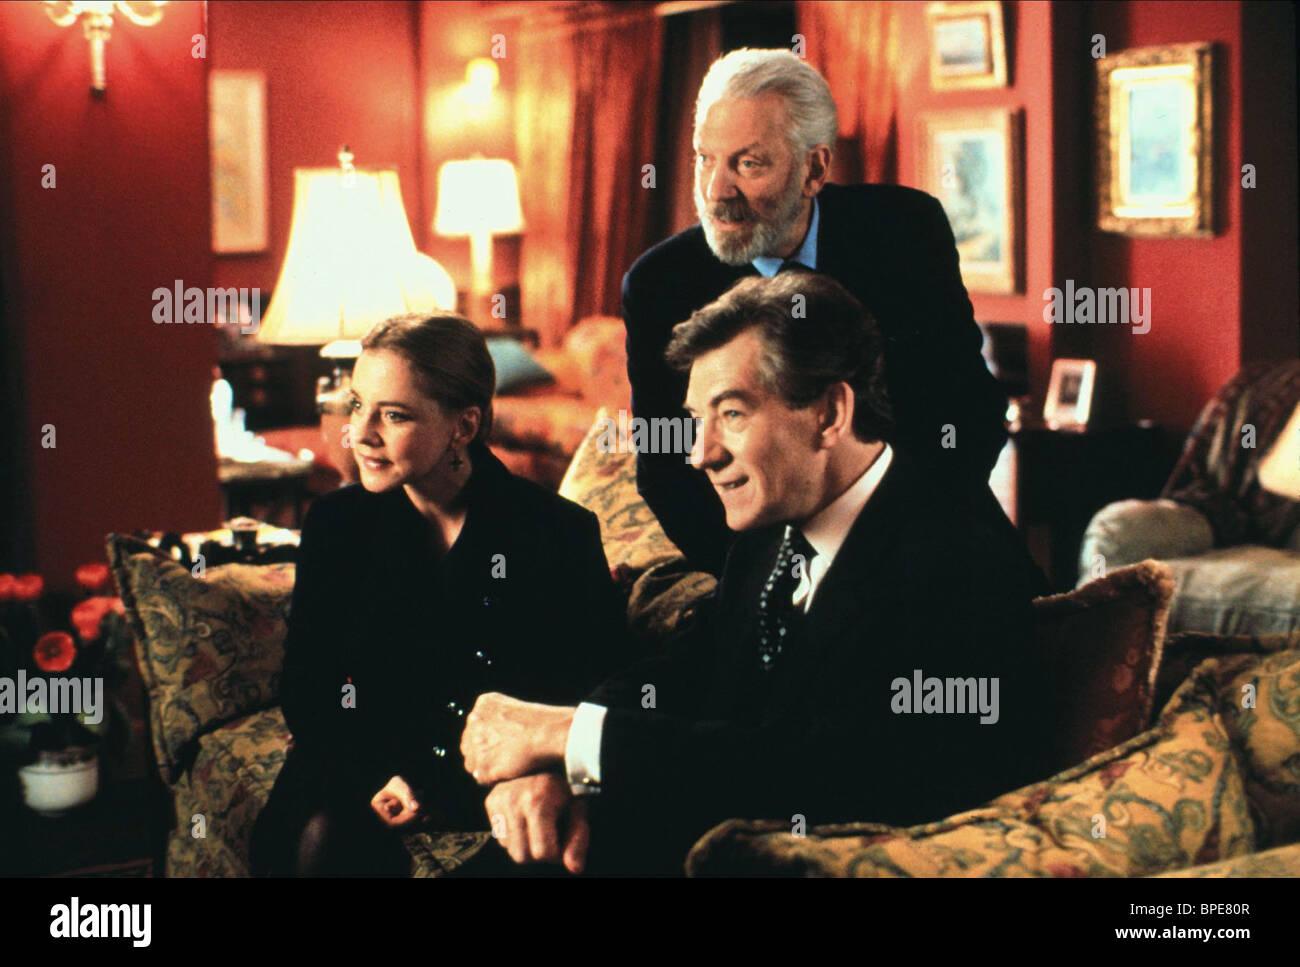 STOCKARD CHANNING DONALD SUTHERLAND IAN MCKELLEN SIX DEGREES OF SEPARATION 1993